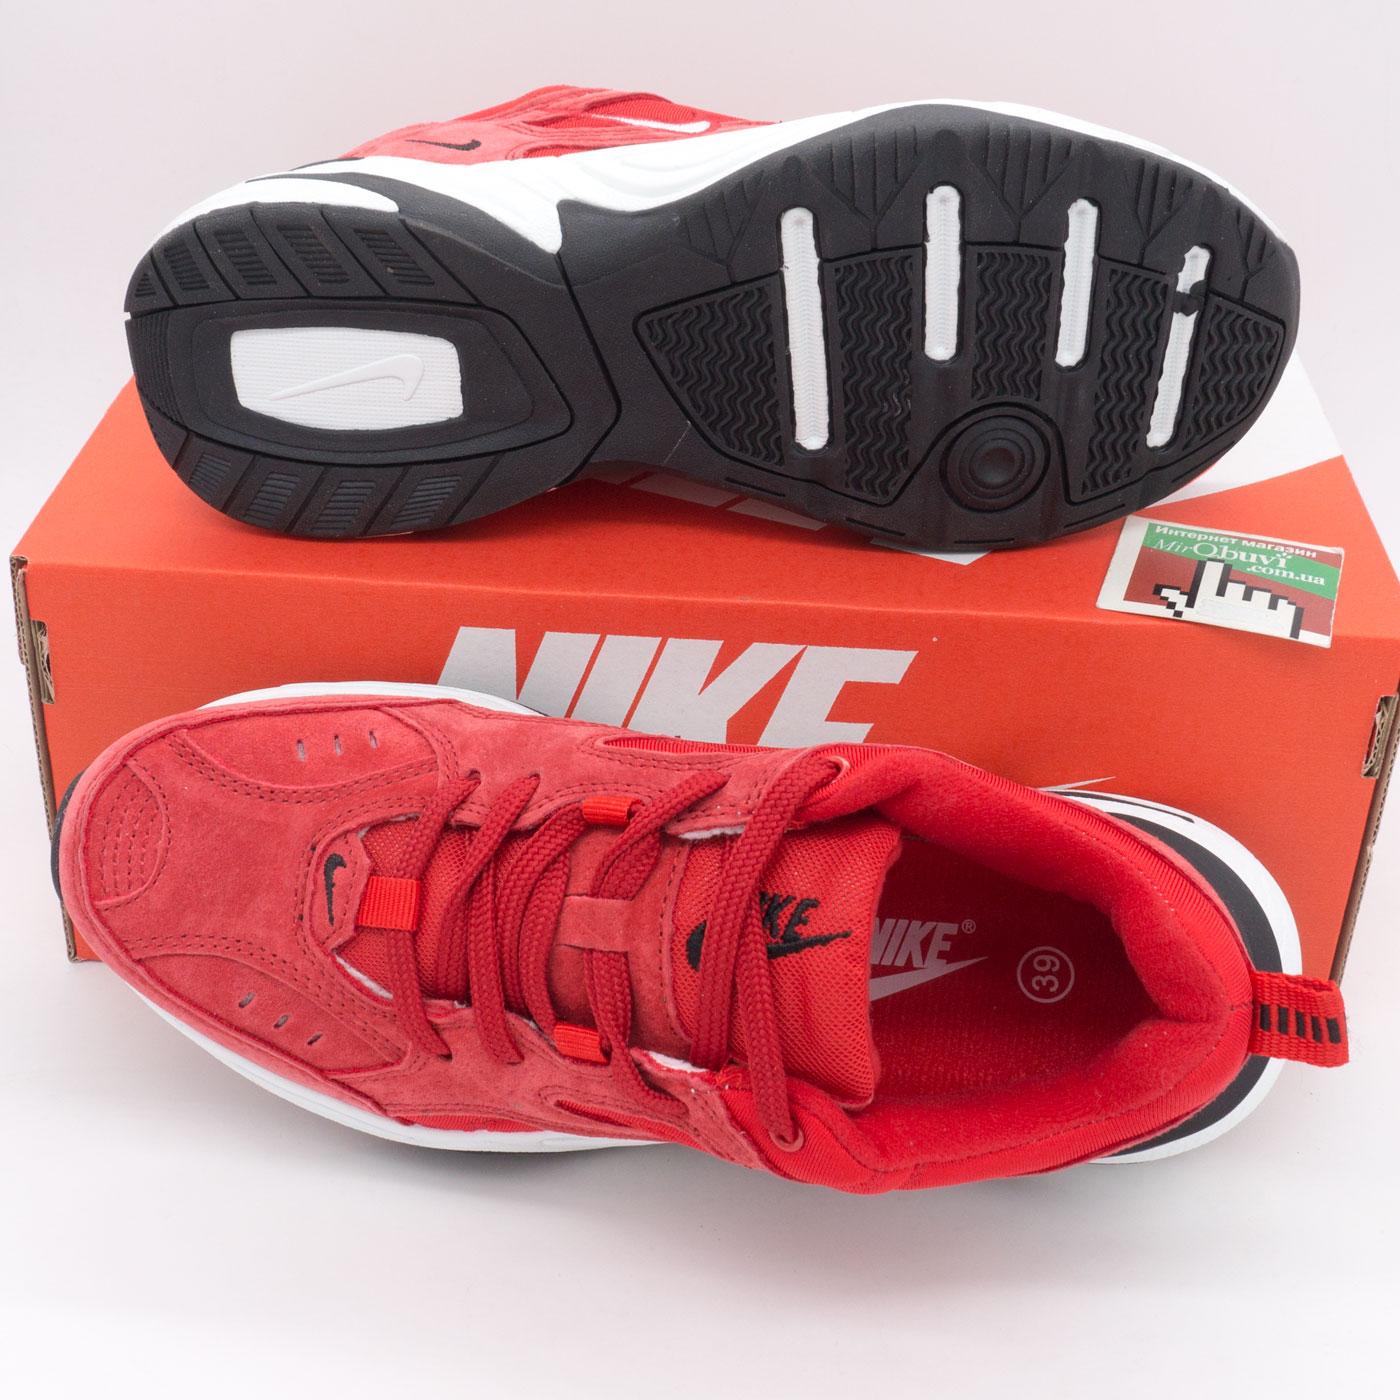 фото bottom Кроссовки Nike M2K Tekno красные bottom